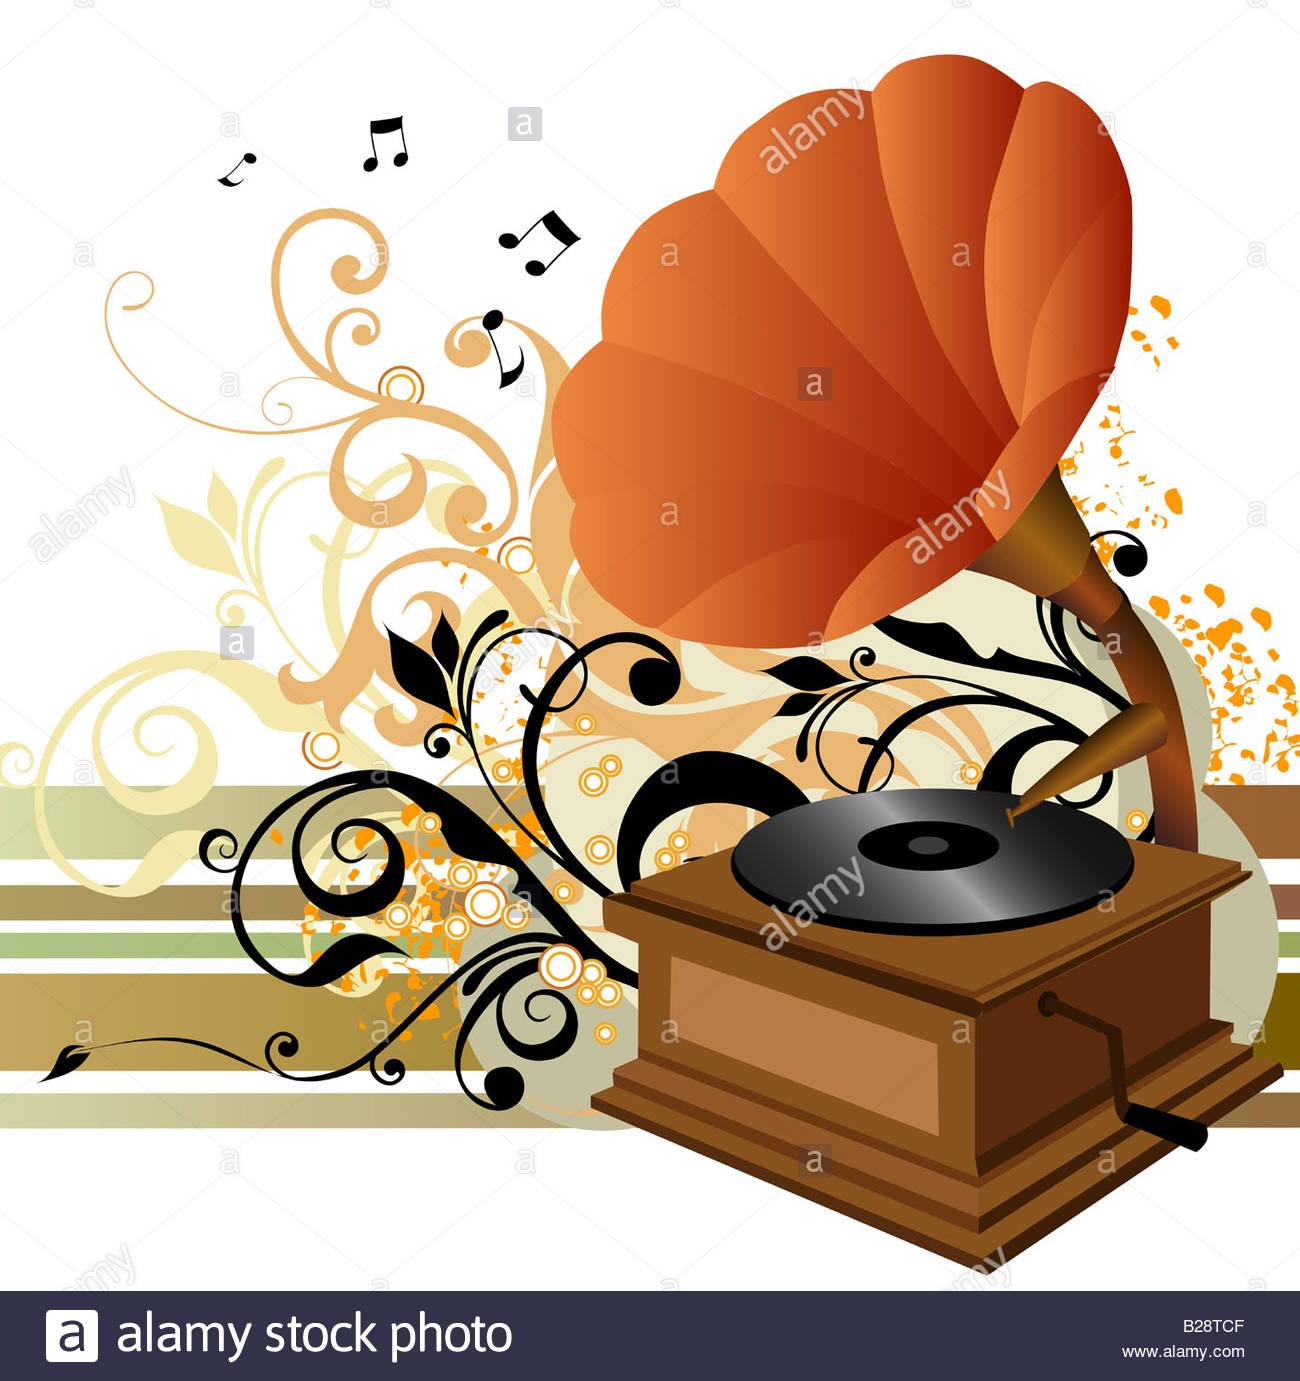 1300x1381 Illustration Drawing Of Music Box Stock Photo 18634463